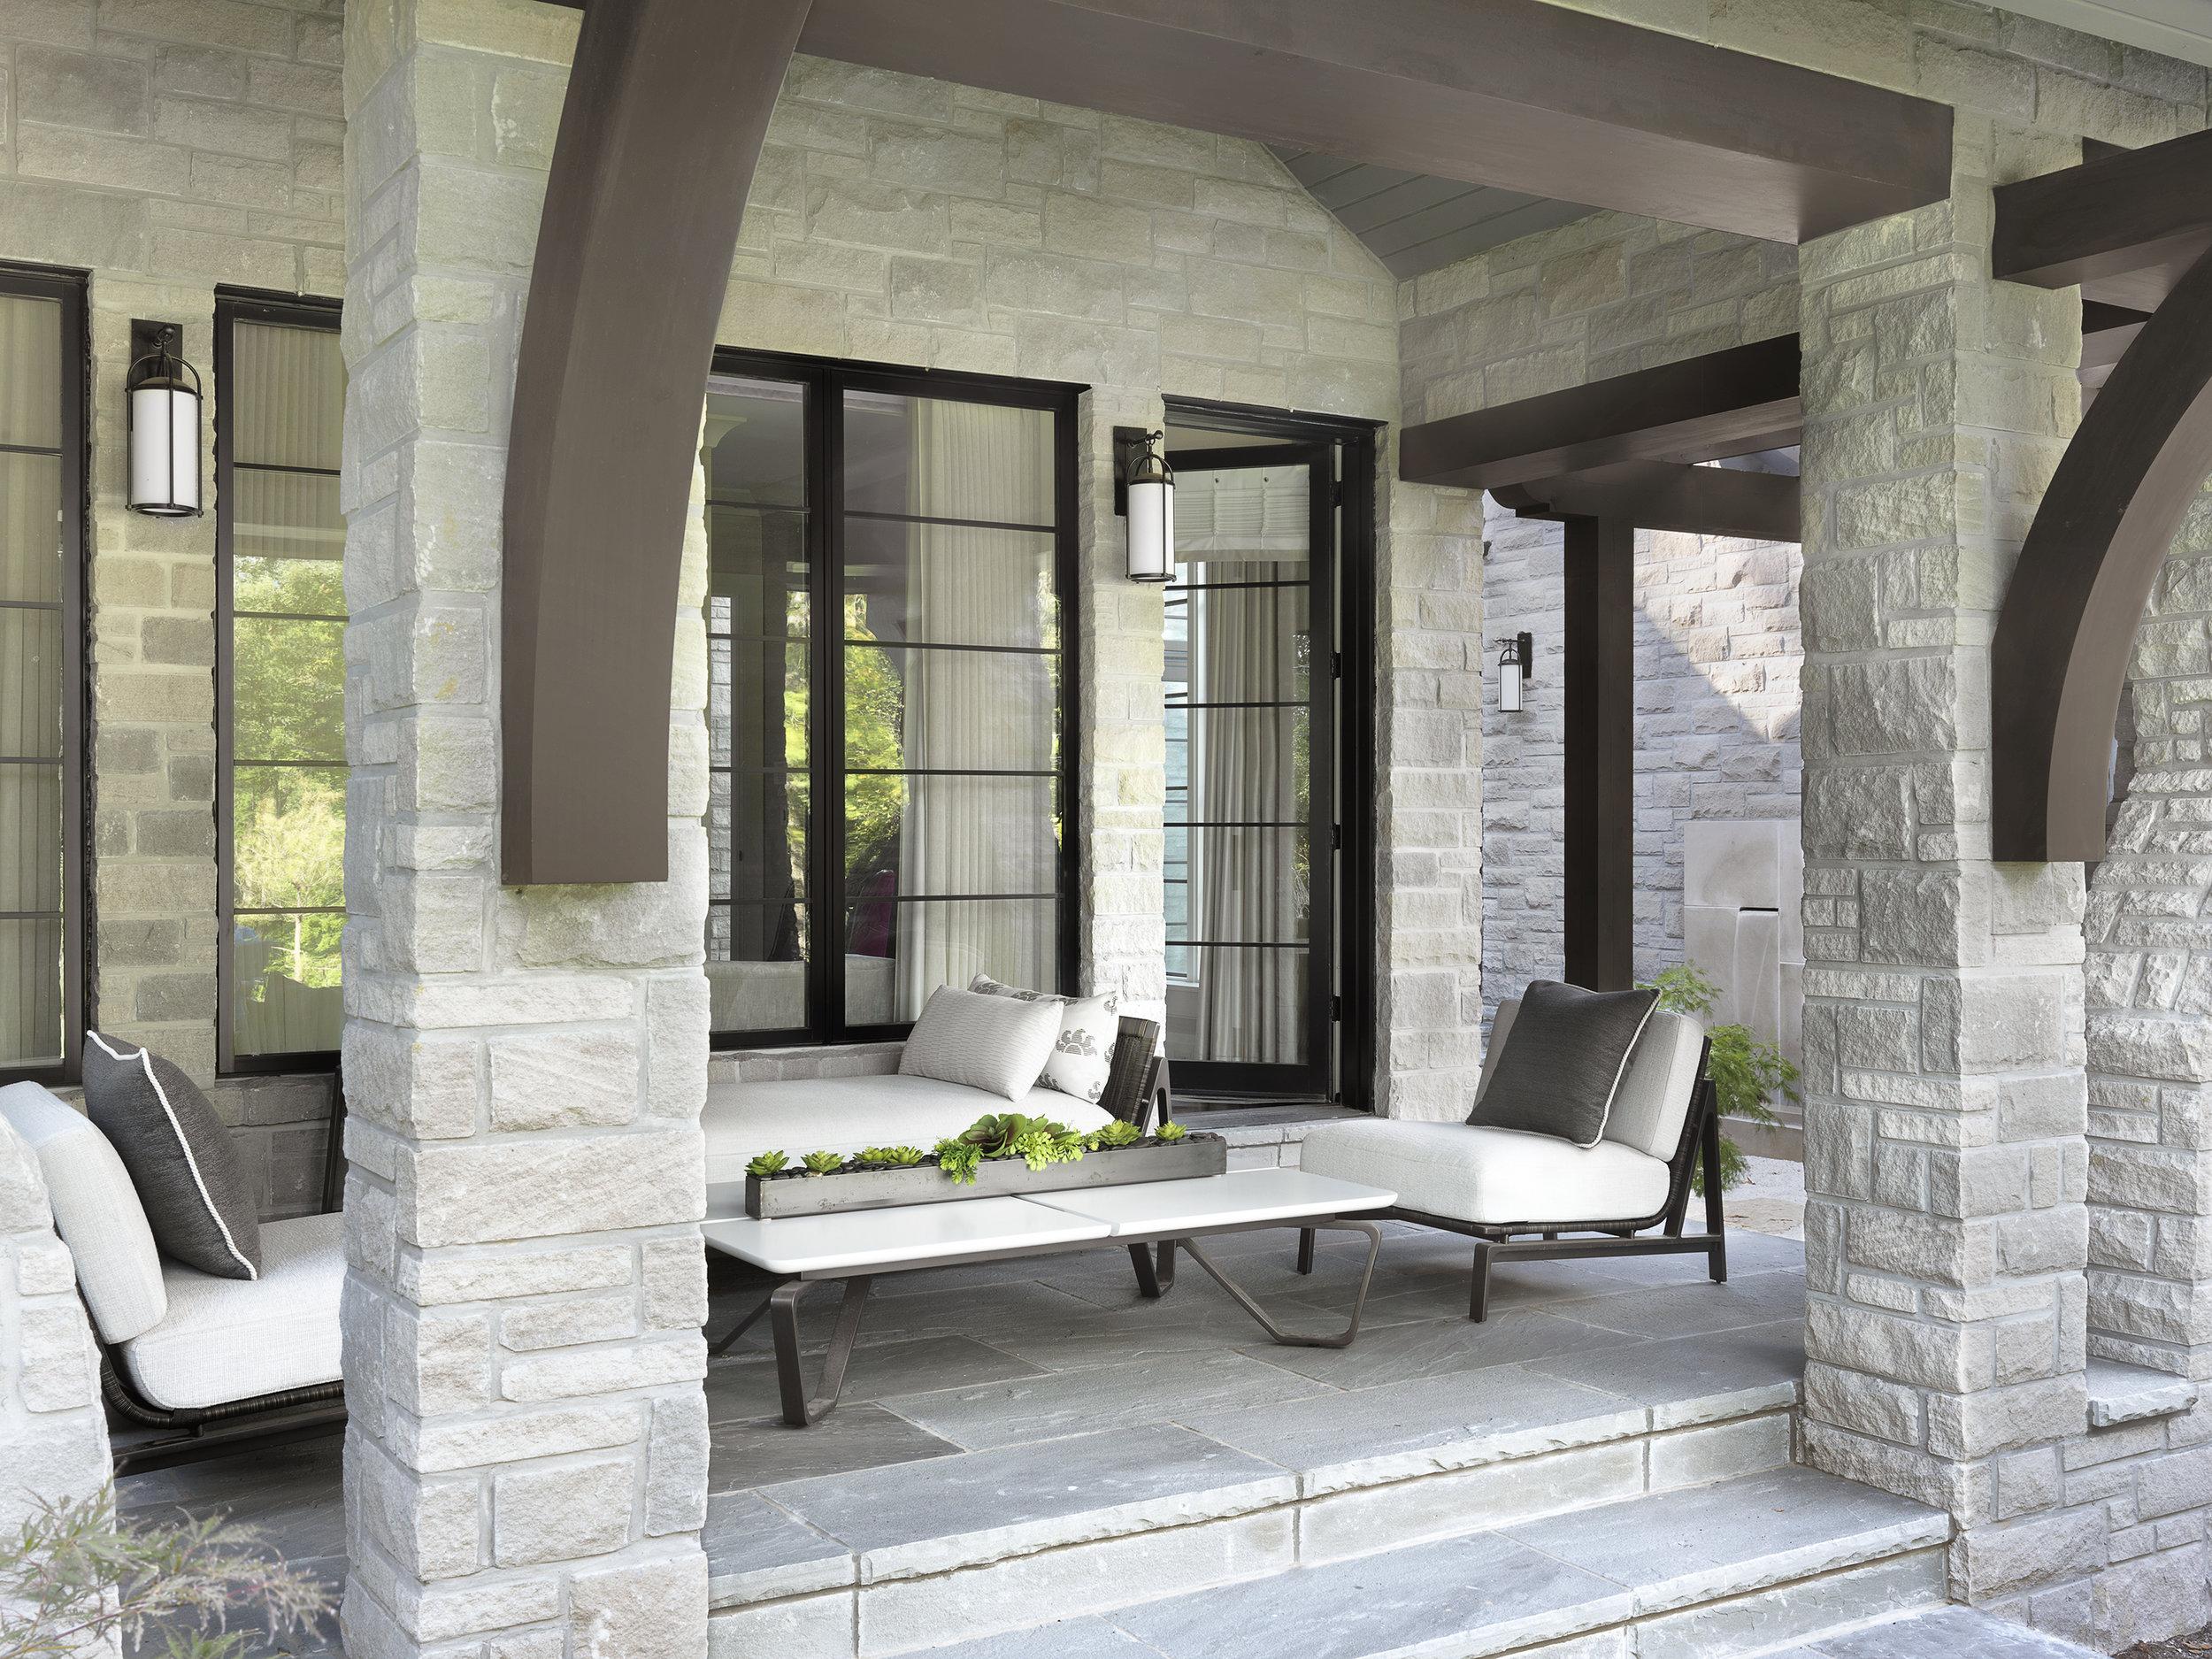 Master Bedroom outdoor living.jpg